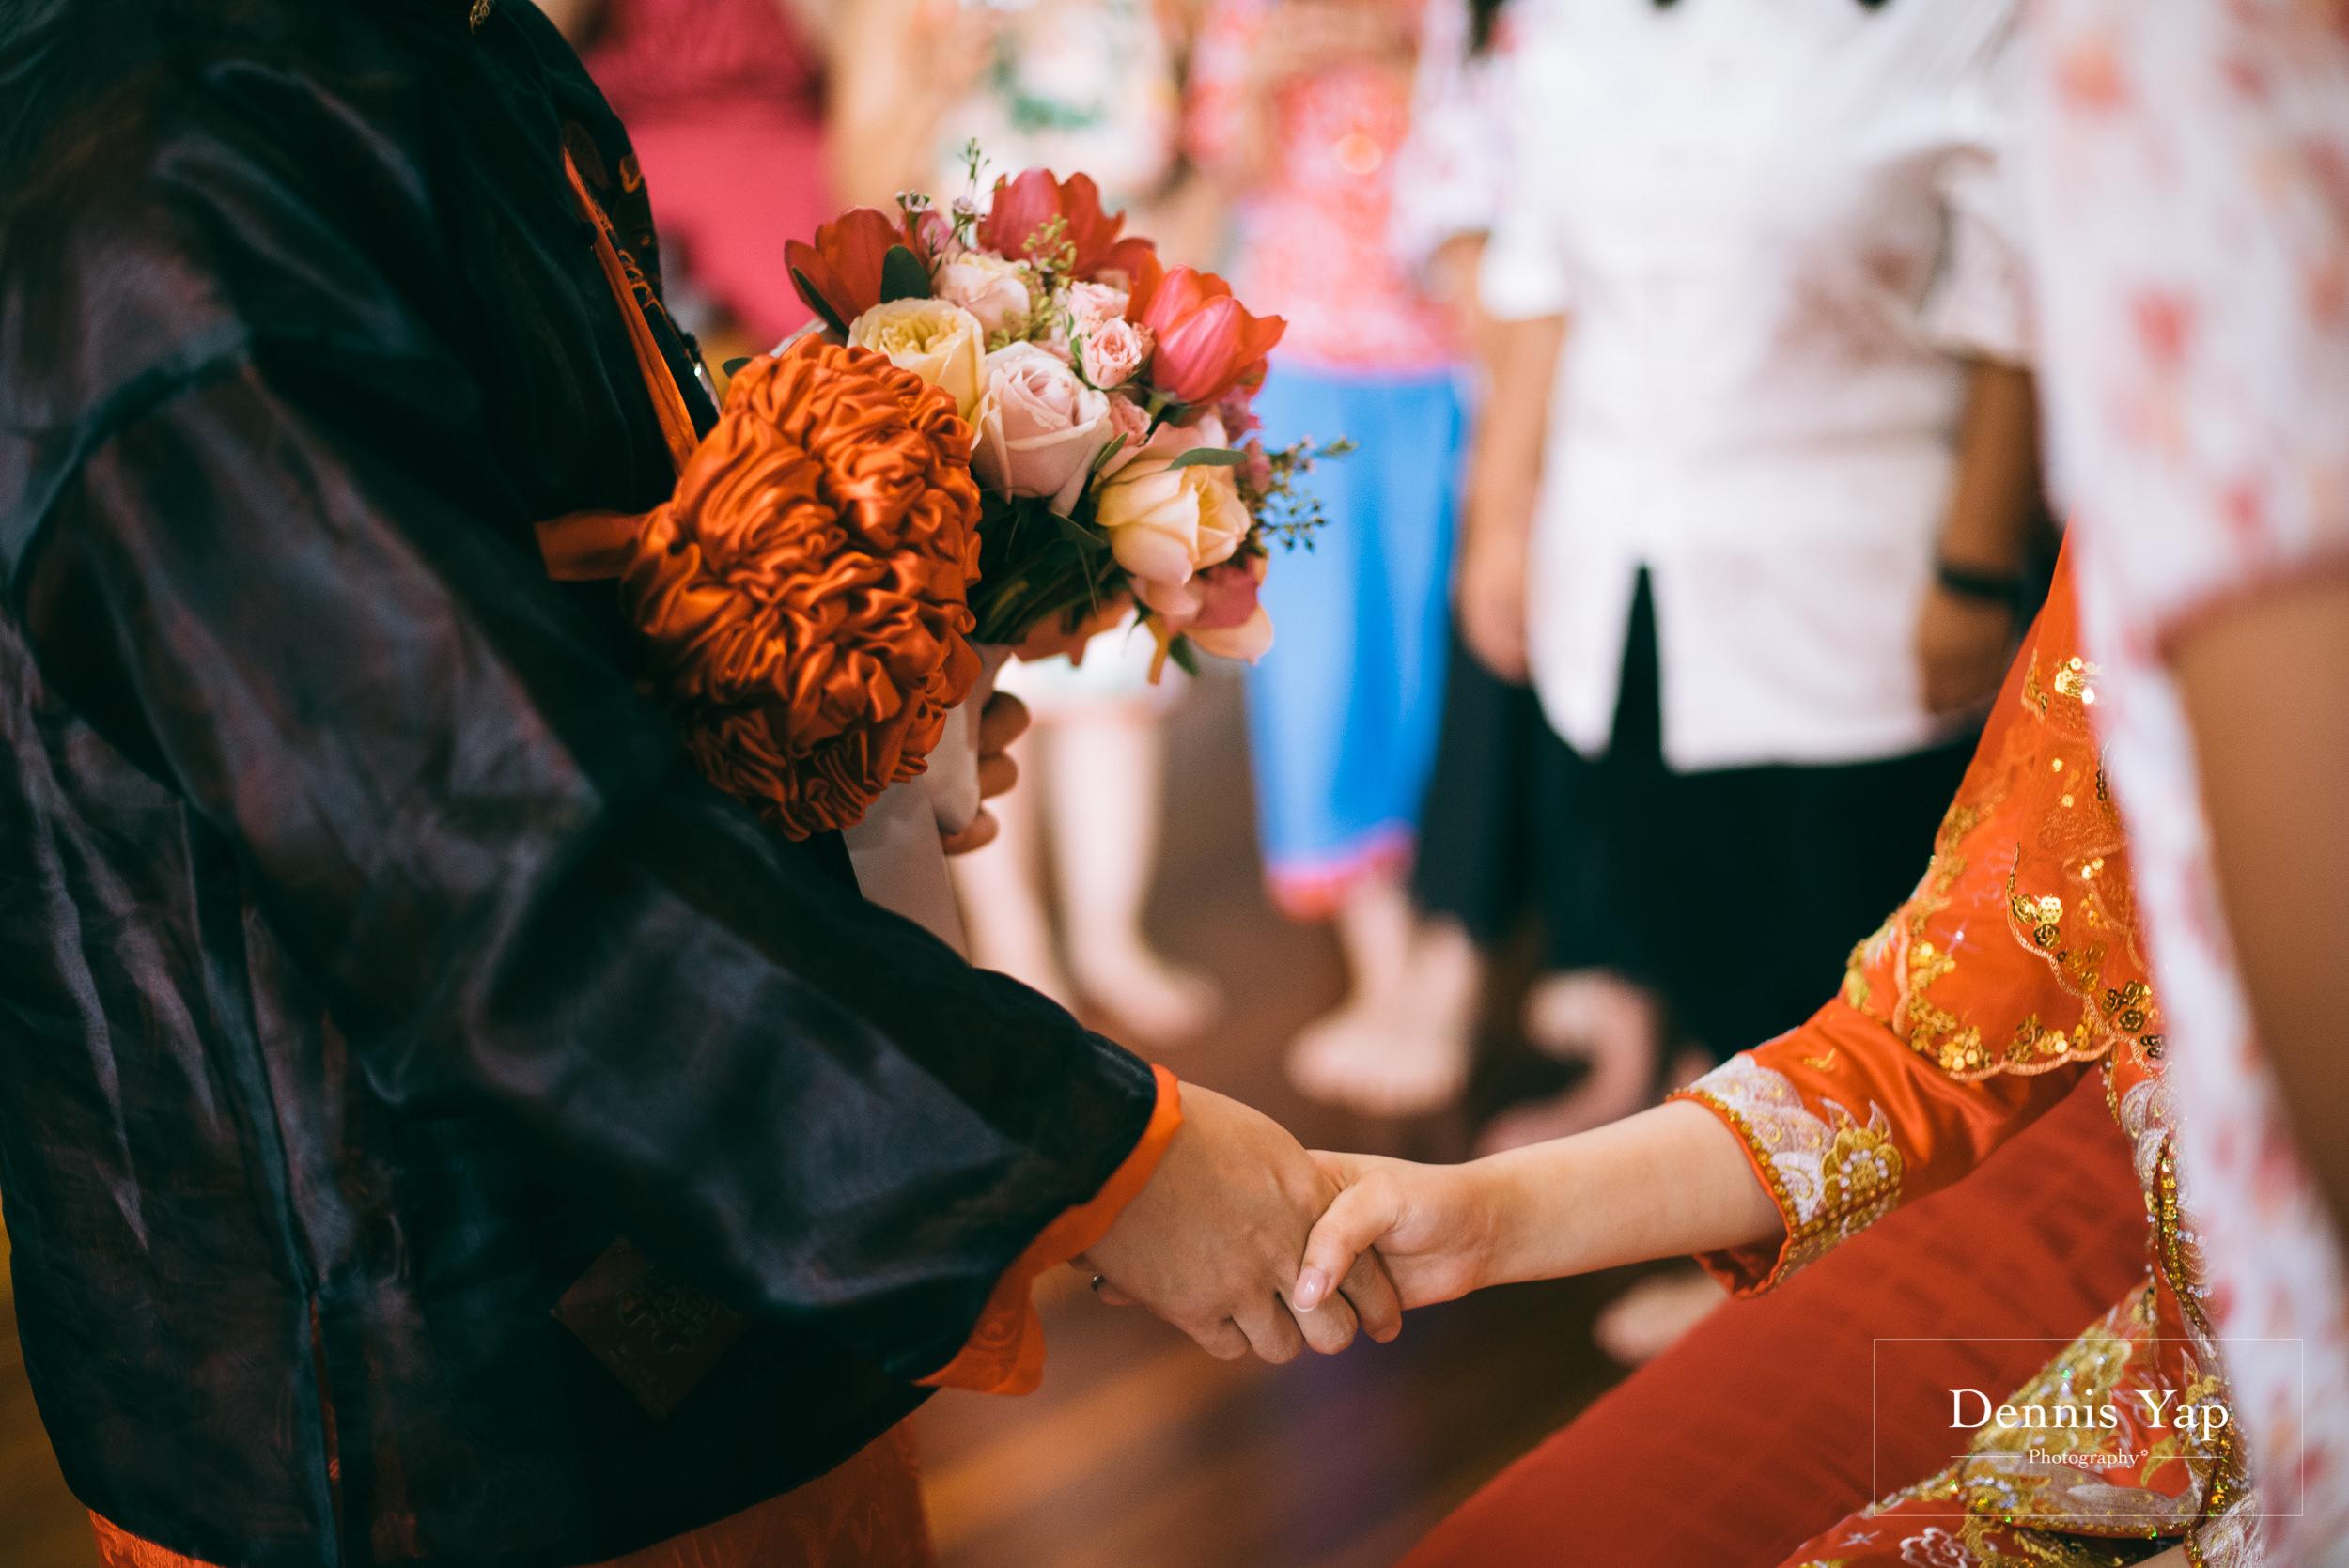 kuan rachel wedding day kuala lumpur melbourne gate crash dennis yap malaysia wedding photographer-18.jpg